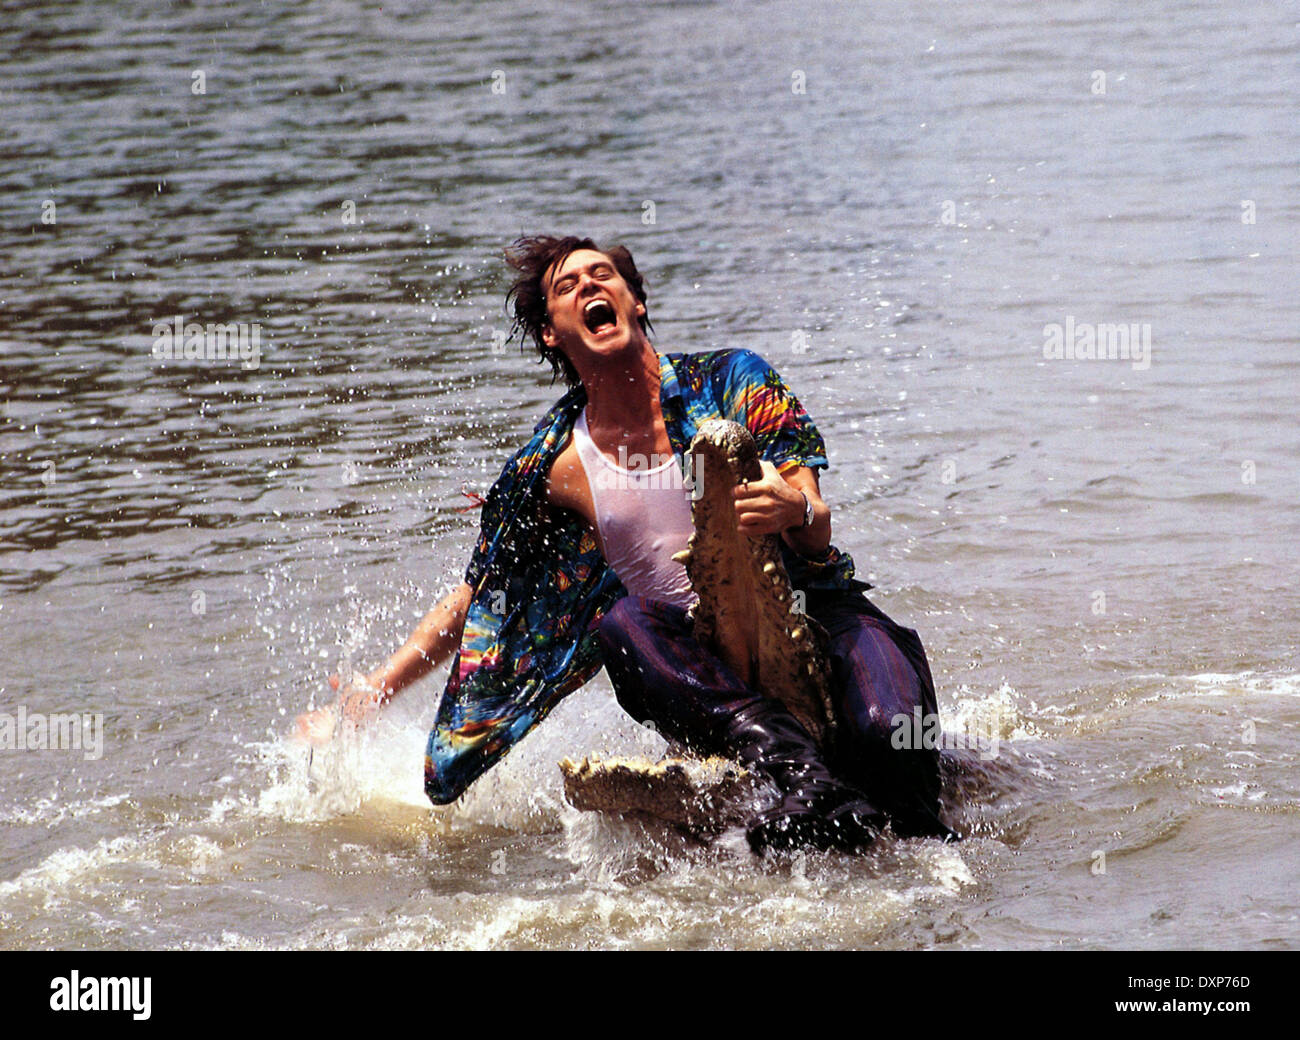 Ace Ventura: When Nature Calls | Netflix